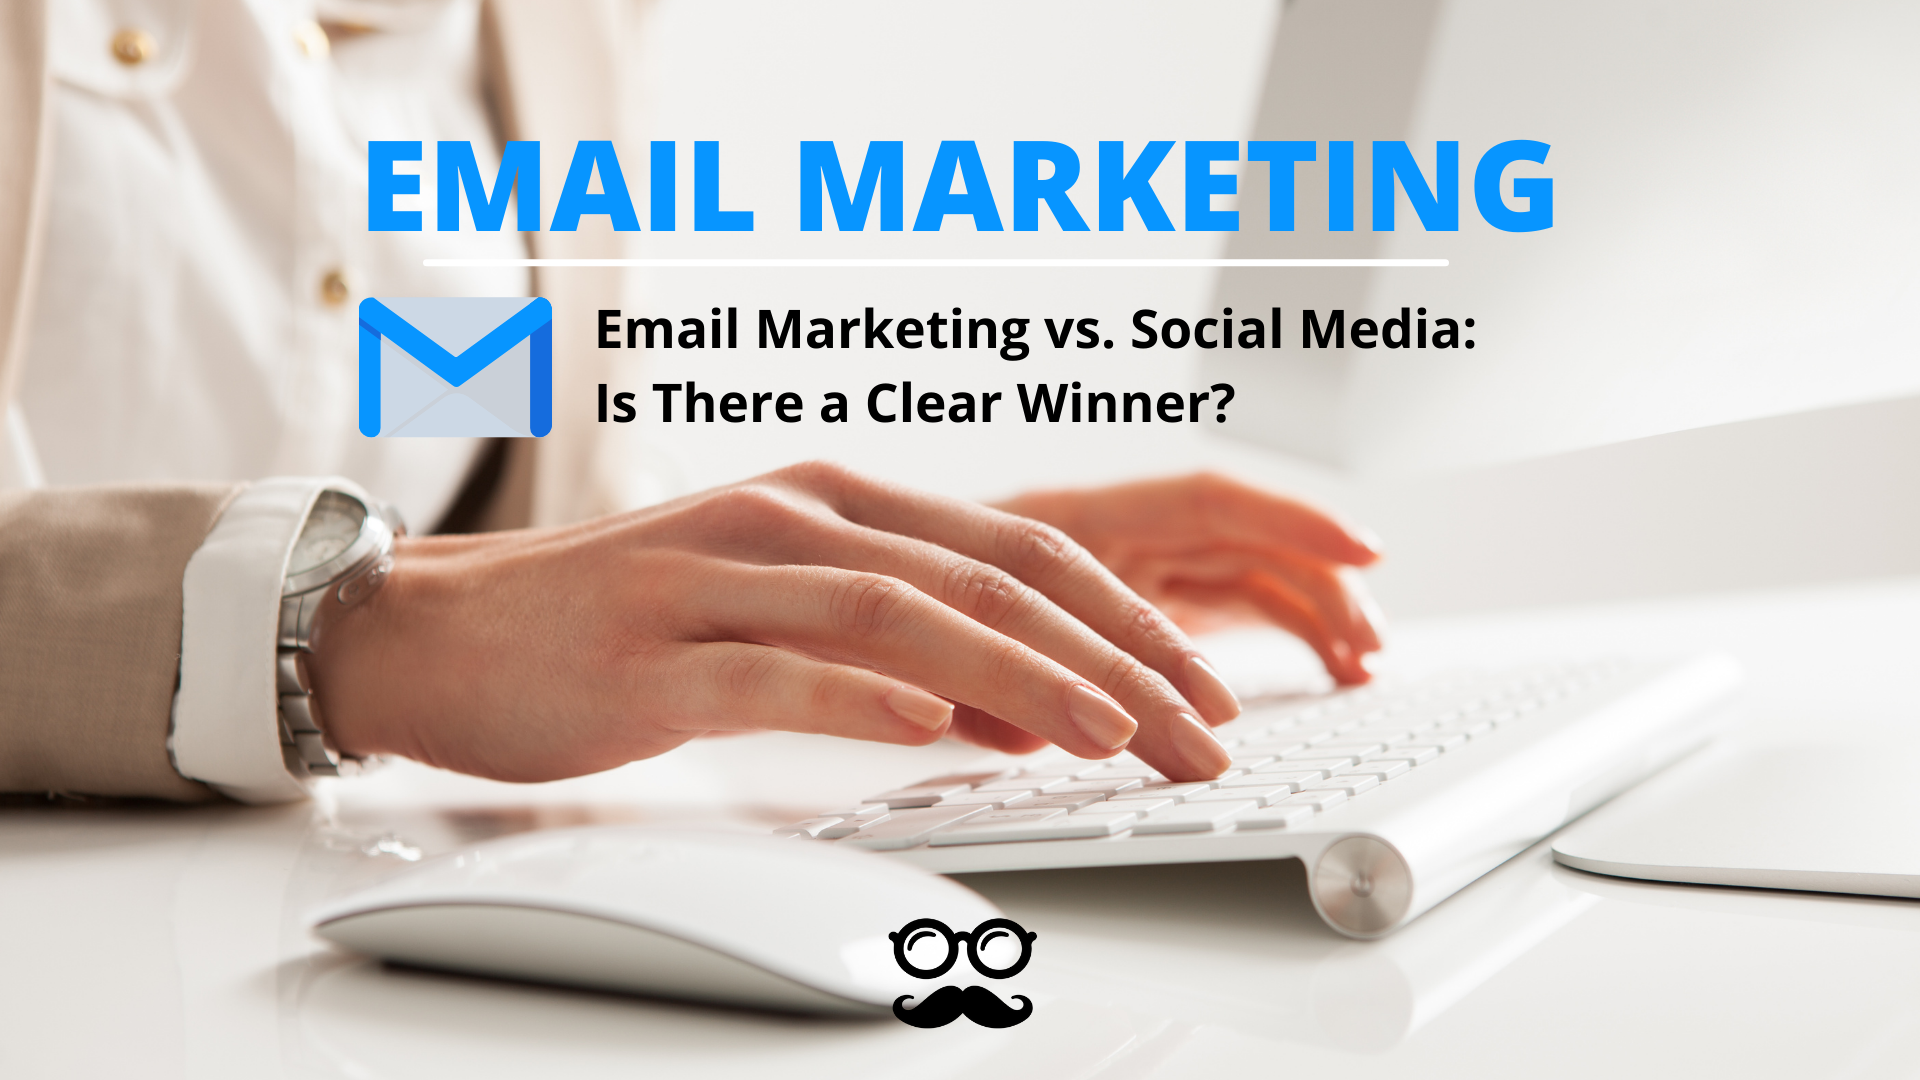 Email Marketing and Social Media Marketing